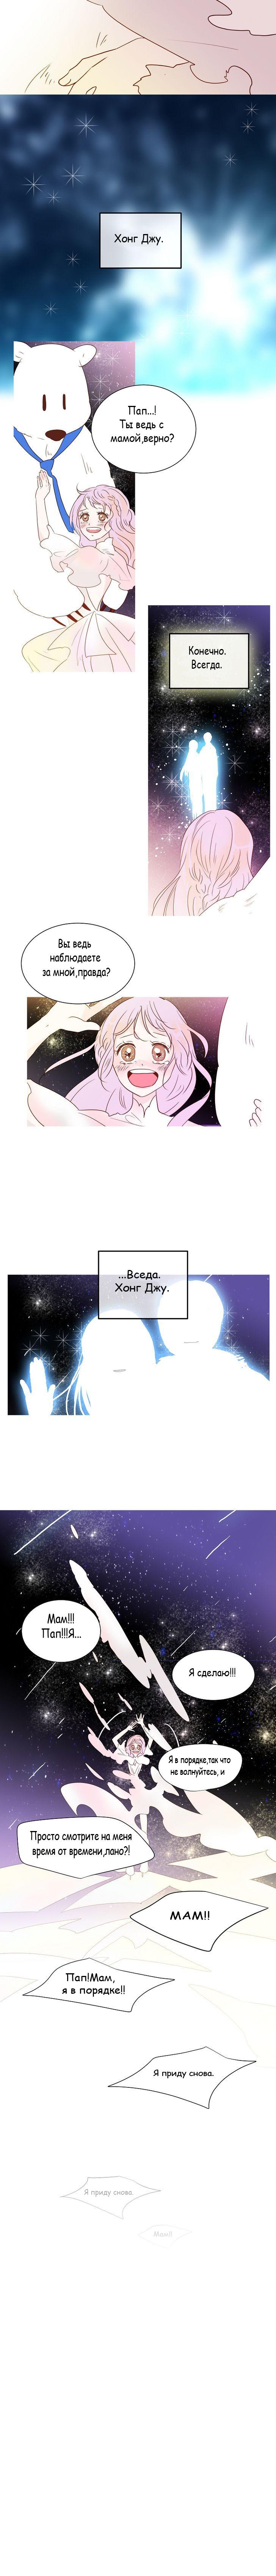 https://r2.ninemanga.com/comics/pic3/32/36128/1299584/154722842675.jpg Page 3